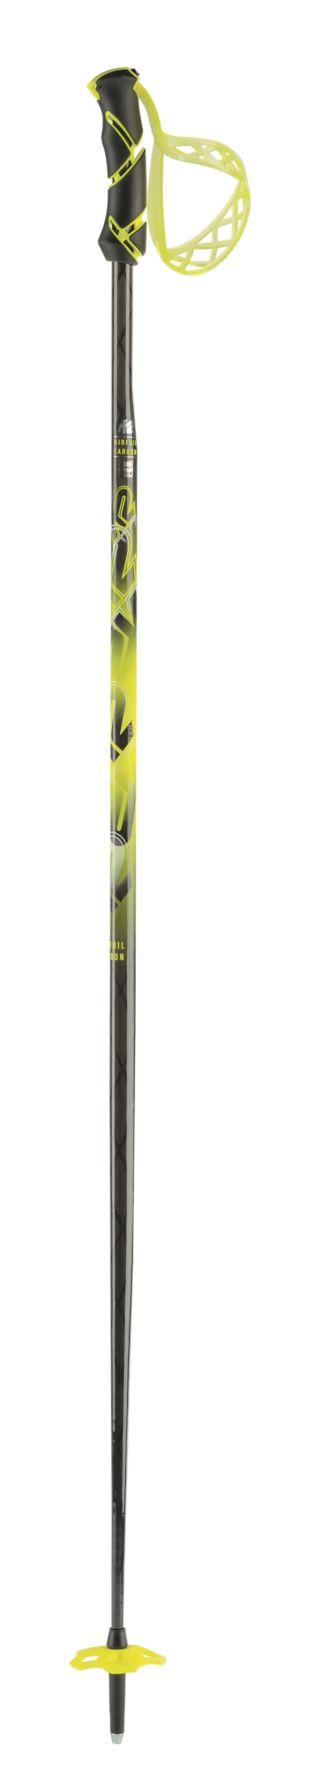 K2 Skis - Power 10 Airfoil Carbon Helmet